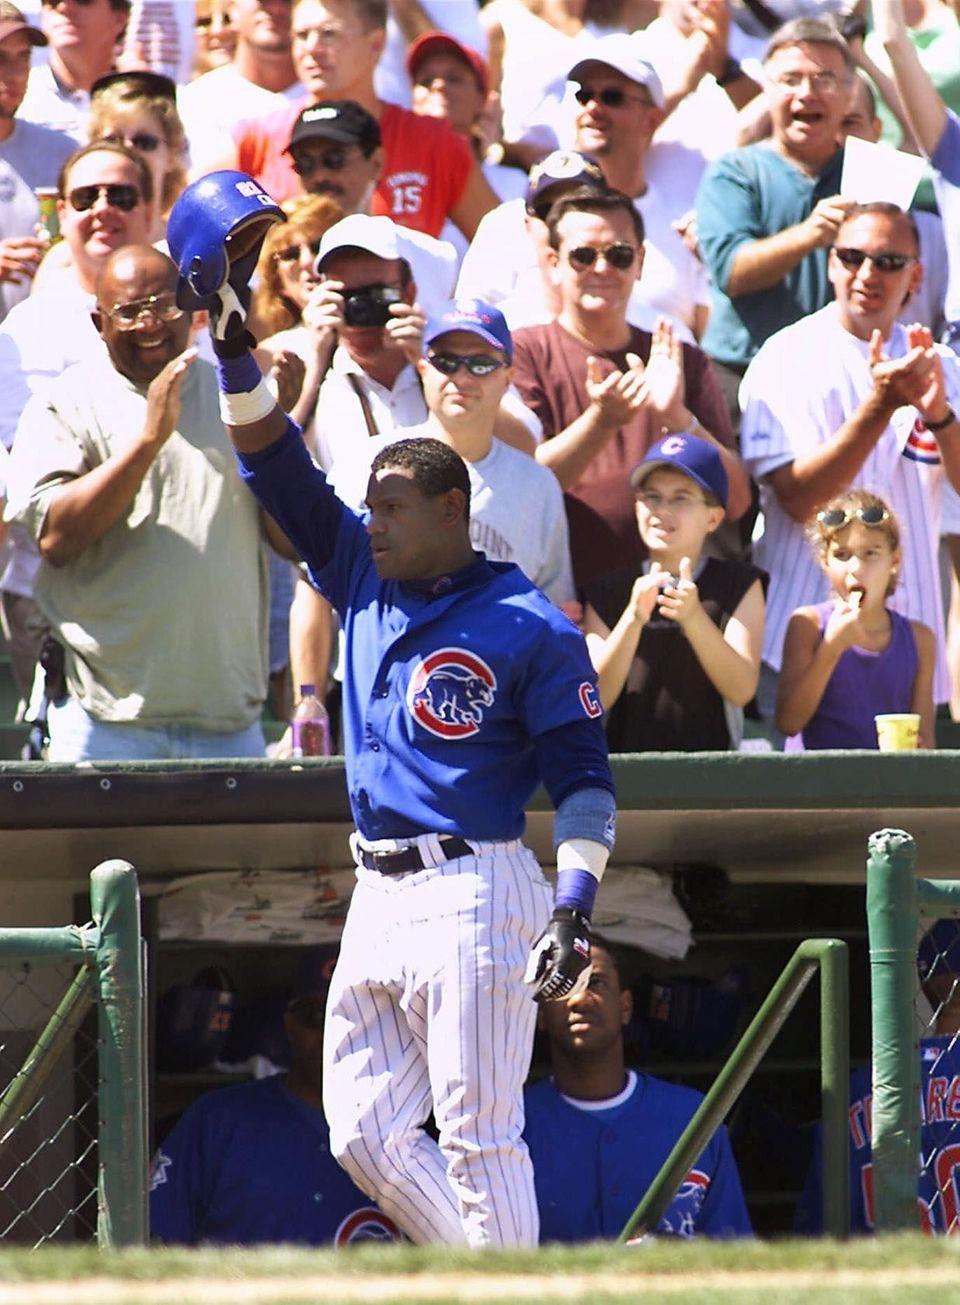 SAMMY SOSA 2001, Chicago Cubs 64 home runs